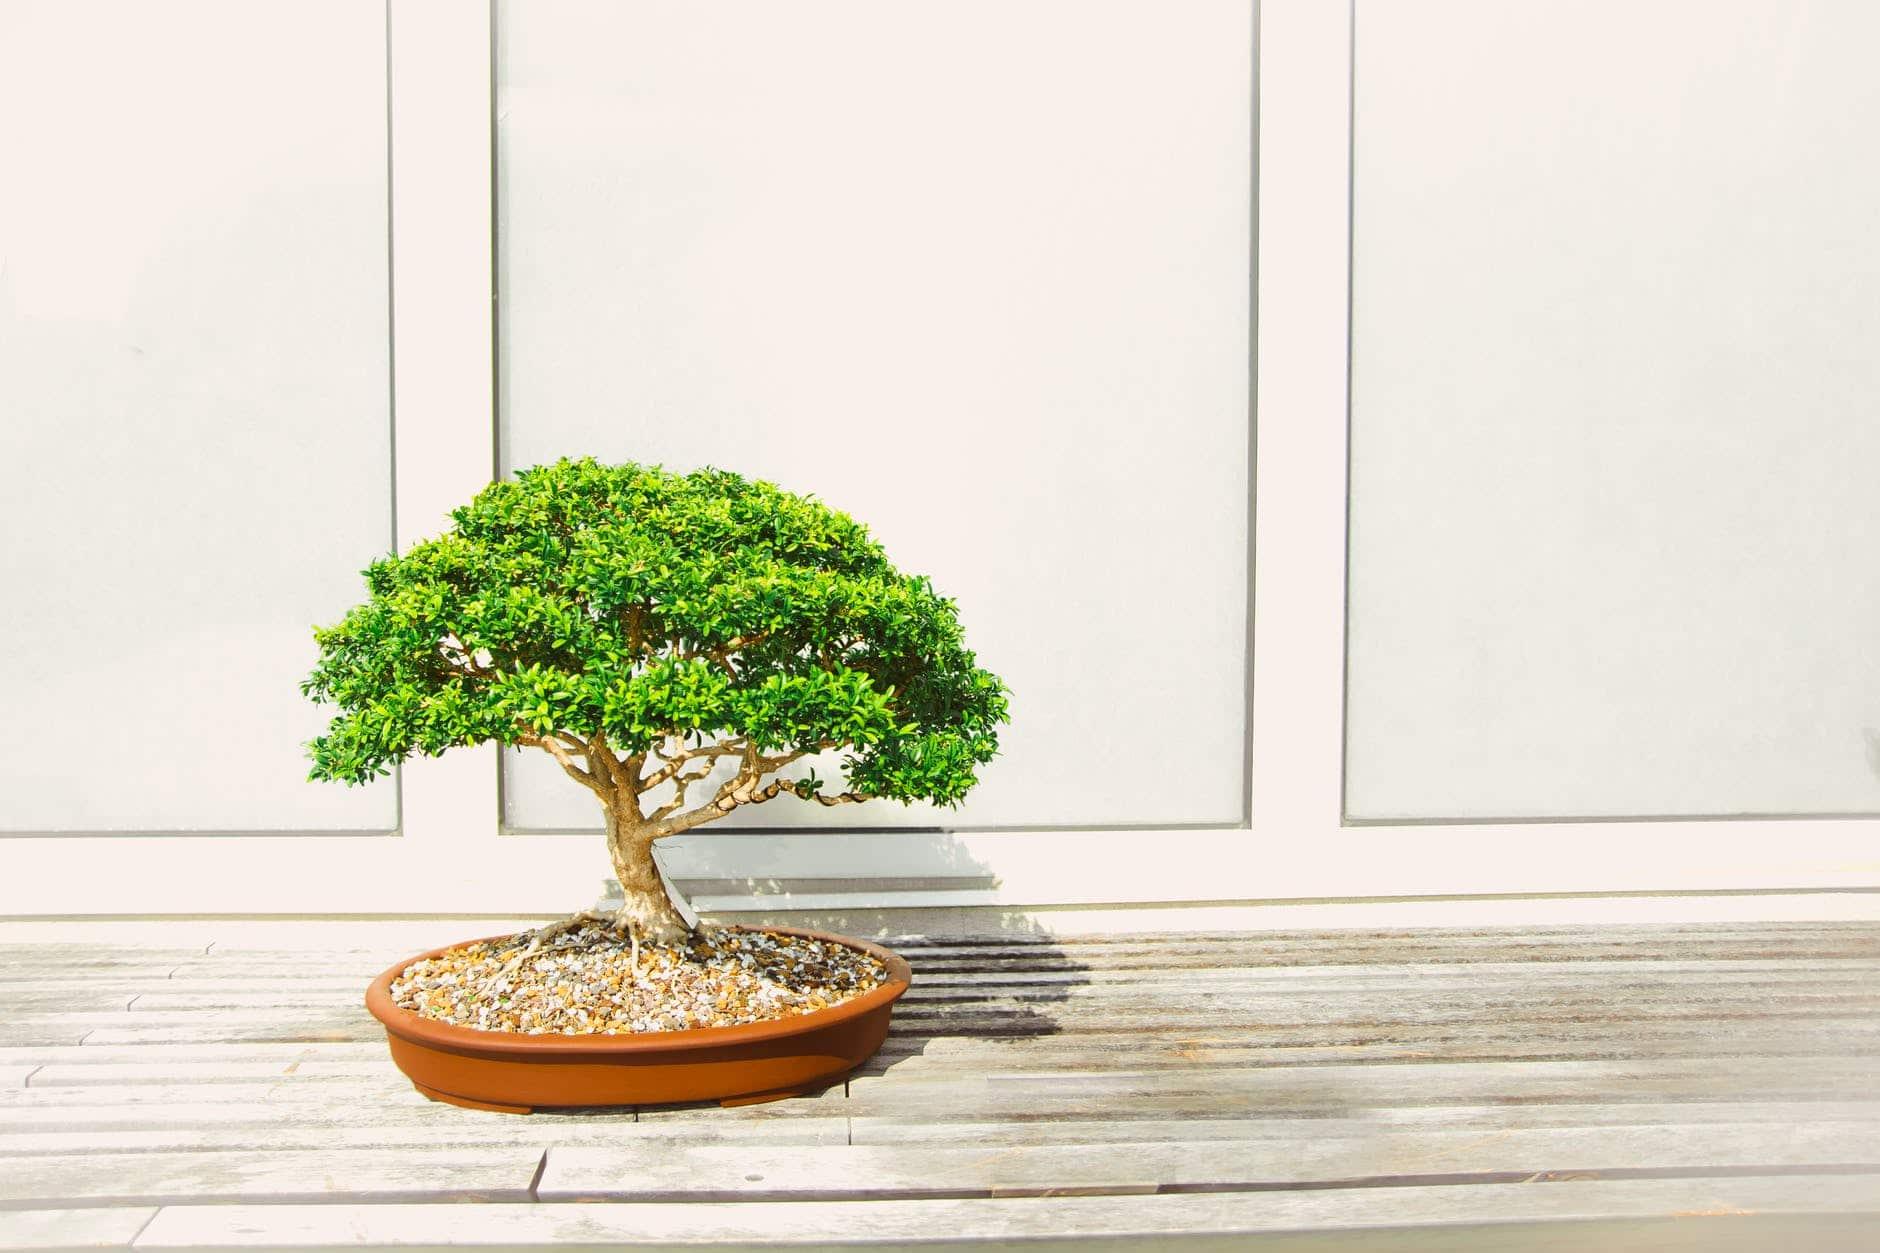 Los bonsais son sensibles al exceso de riego